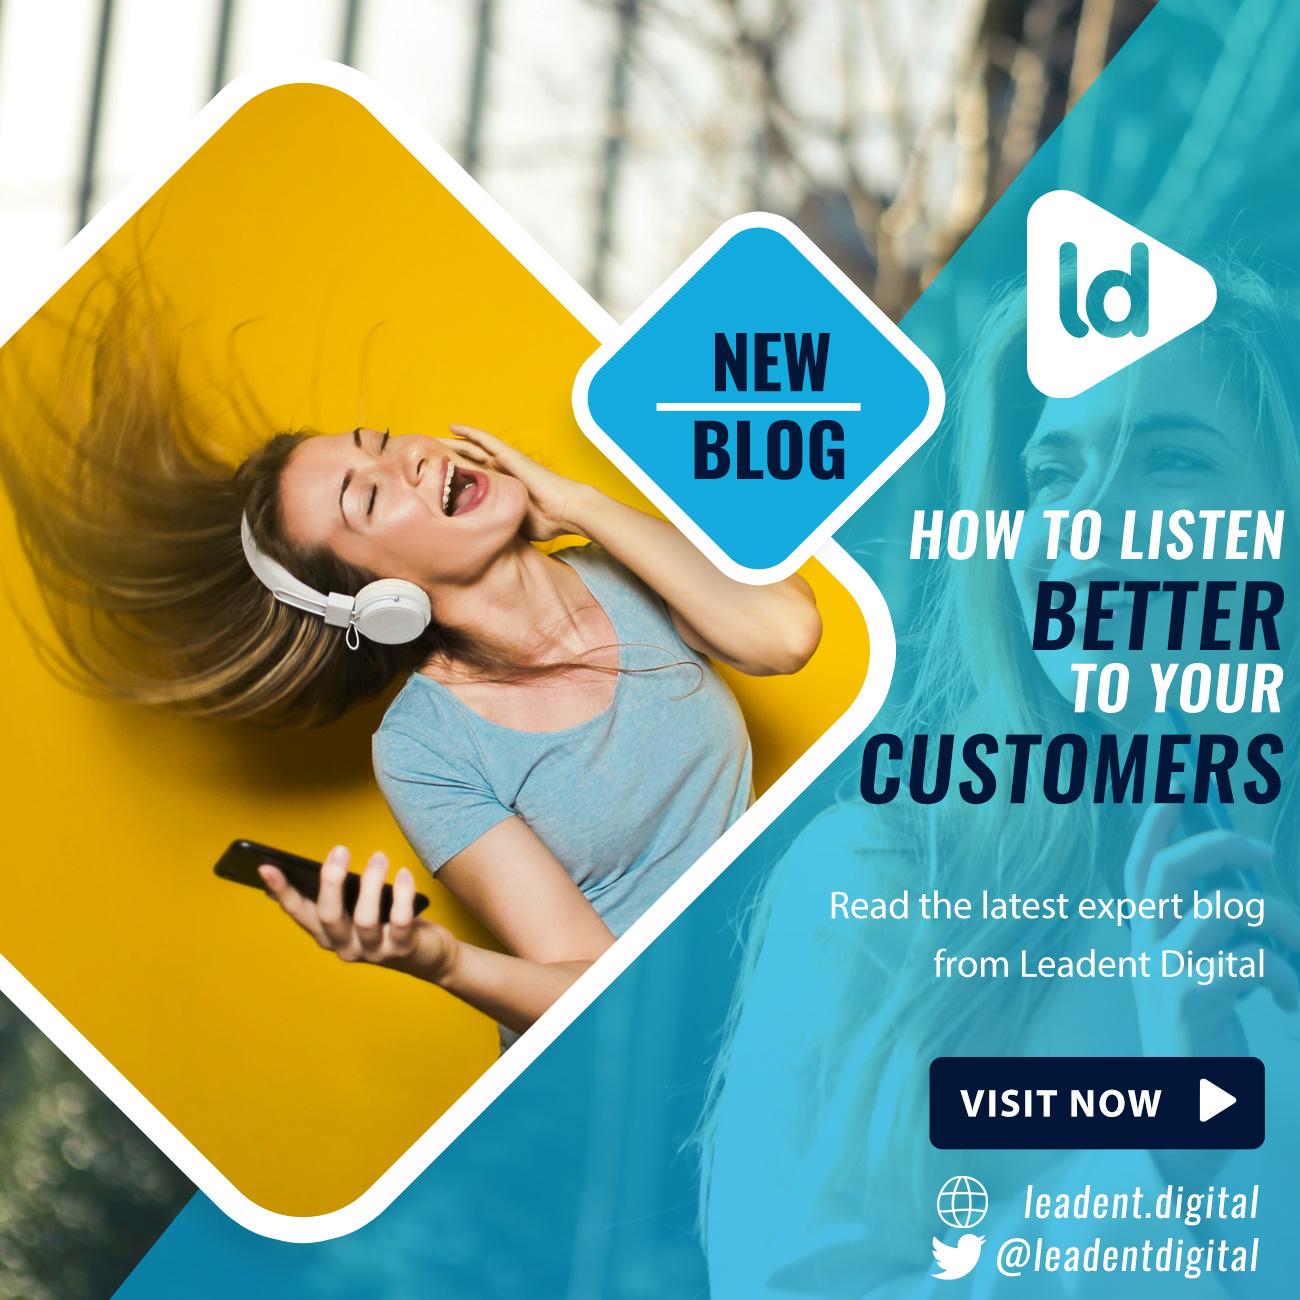 Leadent Digital Blog Promo